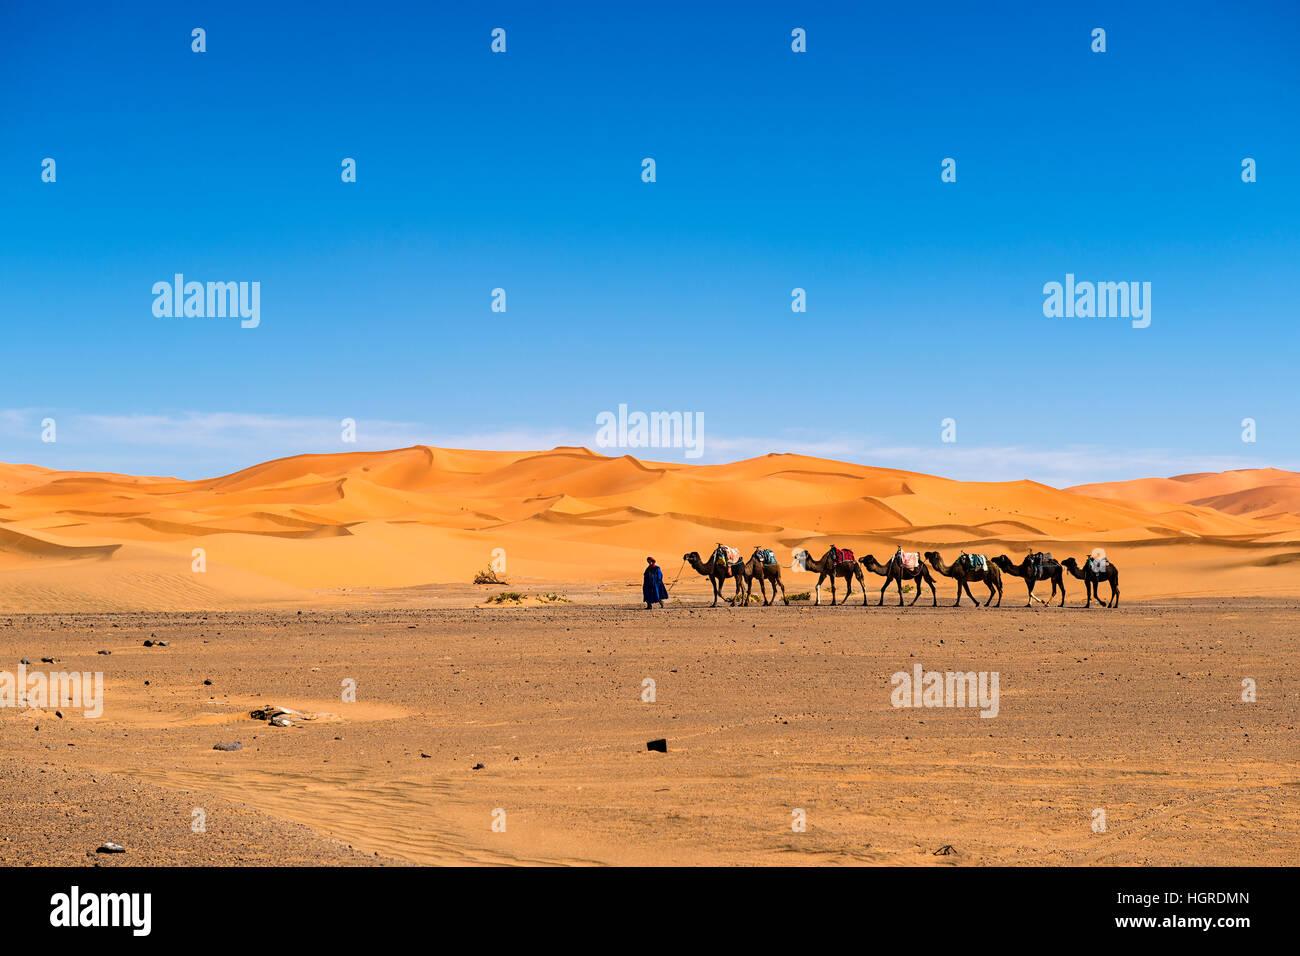 Merzouga, Marokko - 12. April 2016: Berber Mann an der Spitze einer Kamel-Karawane in den Erg Chebbi-Dünen Stockbild